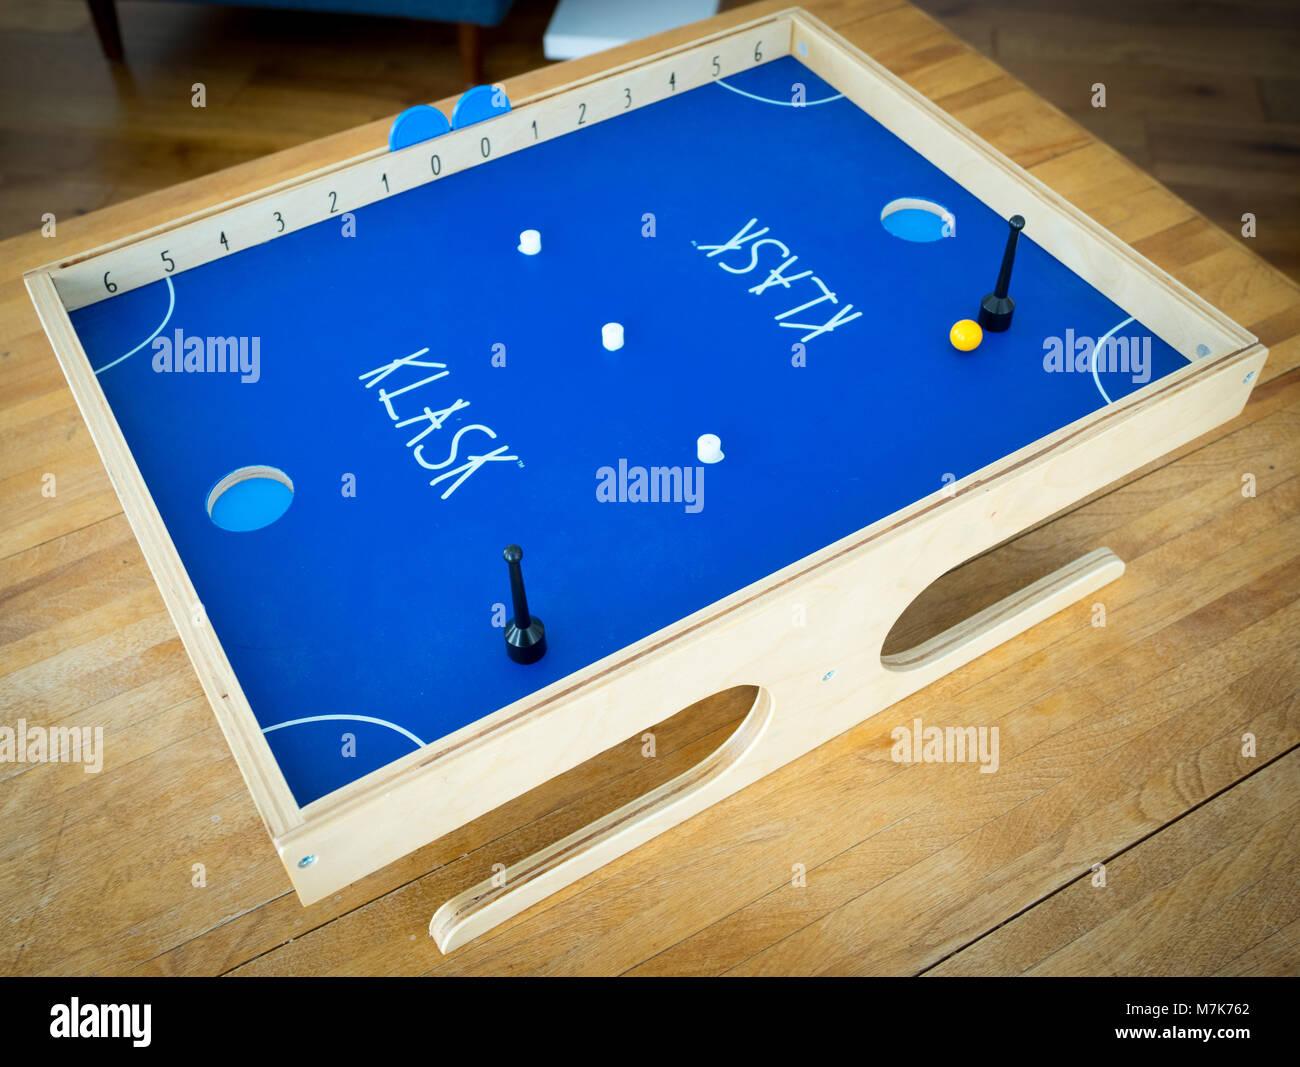 A Klask game board.  Klask is a popular pub game from Denmark. - Stock Image